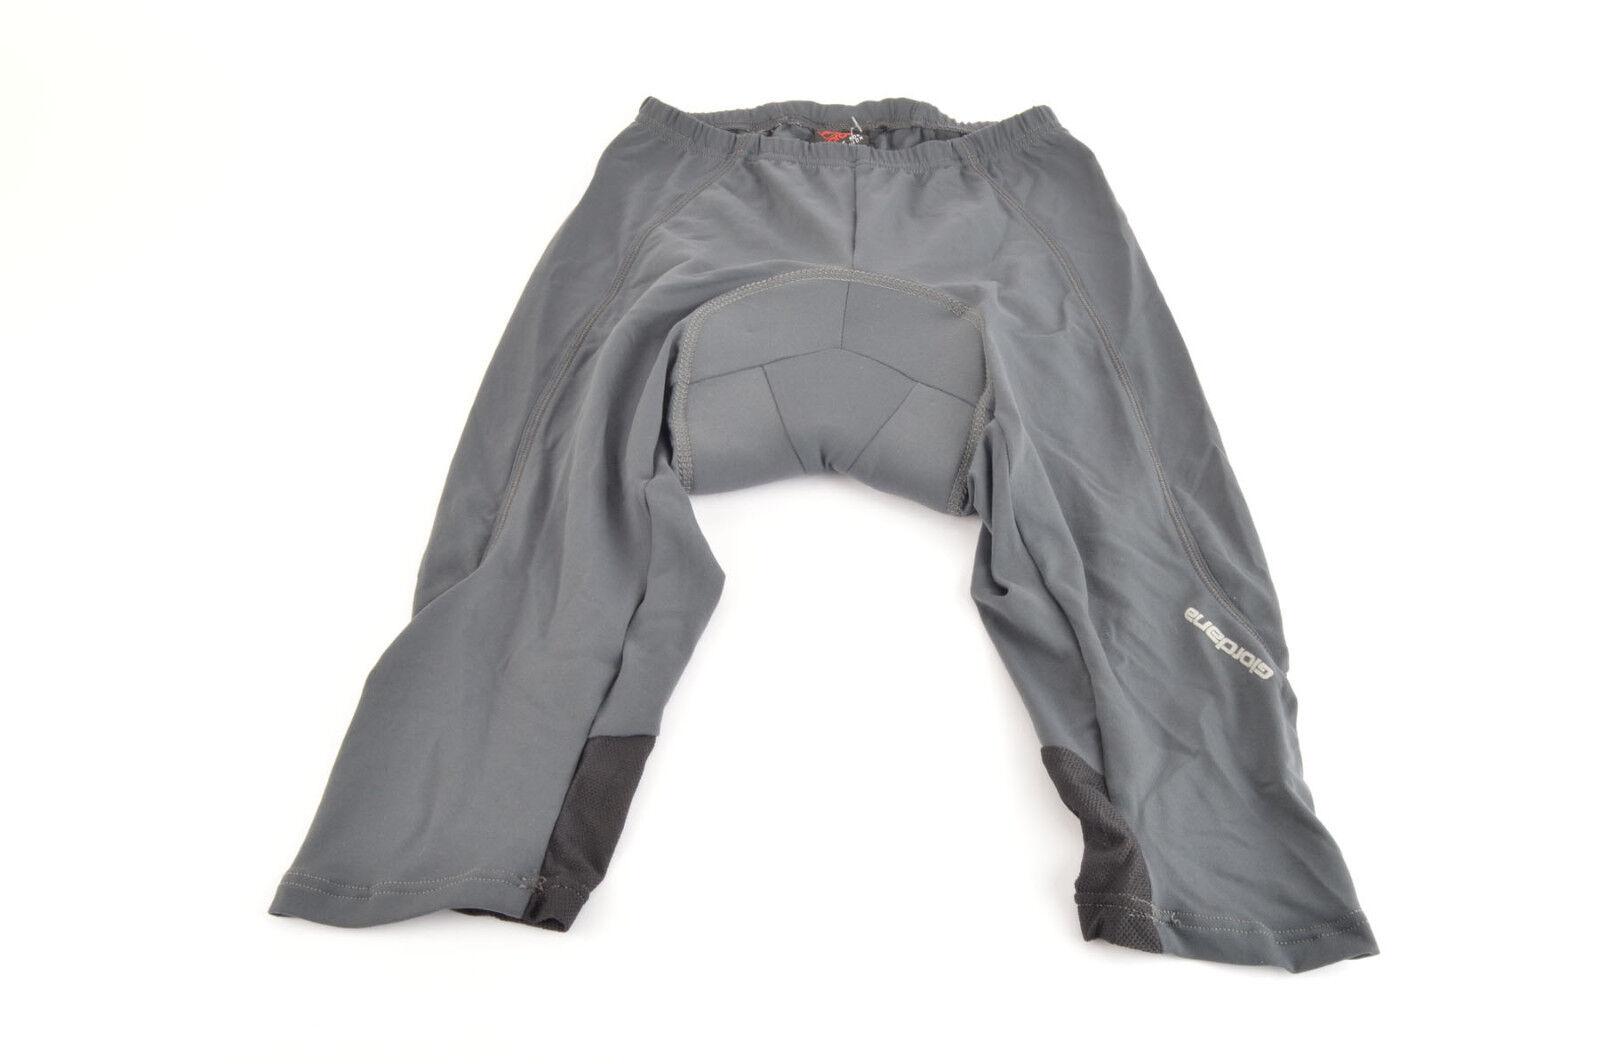 NEW Giordana daSie \\\;A399WK Padded Shorts in Größe S